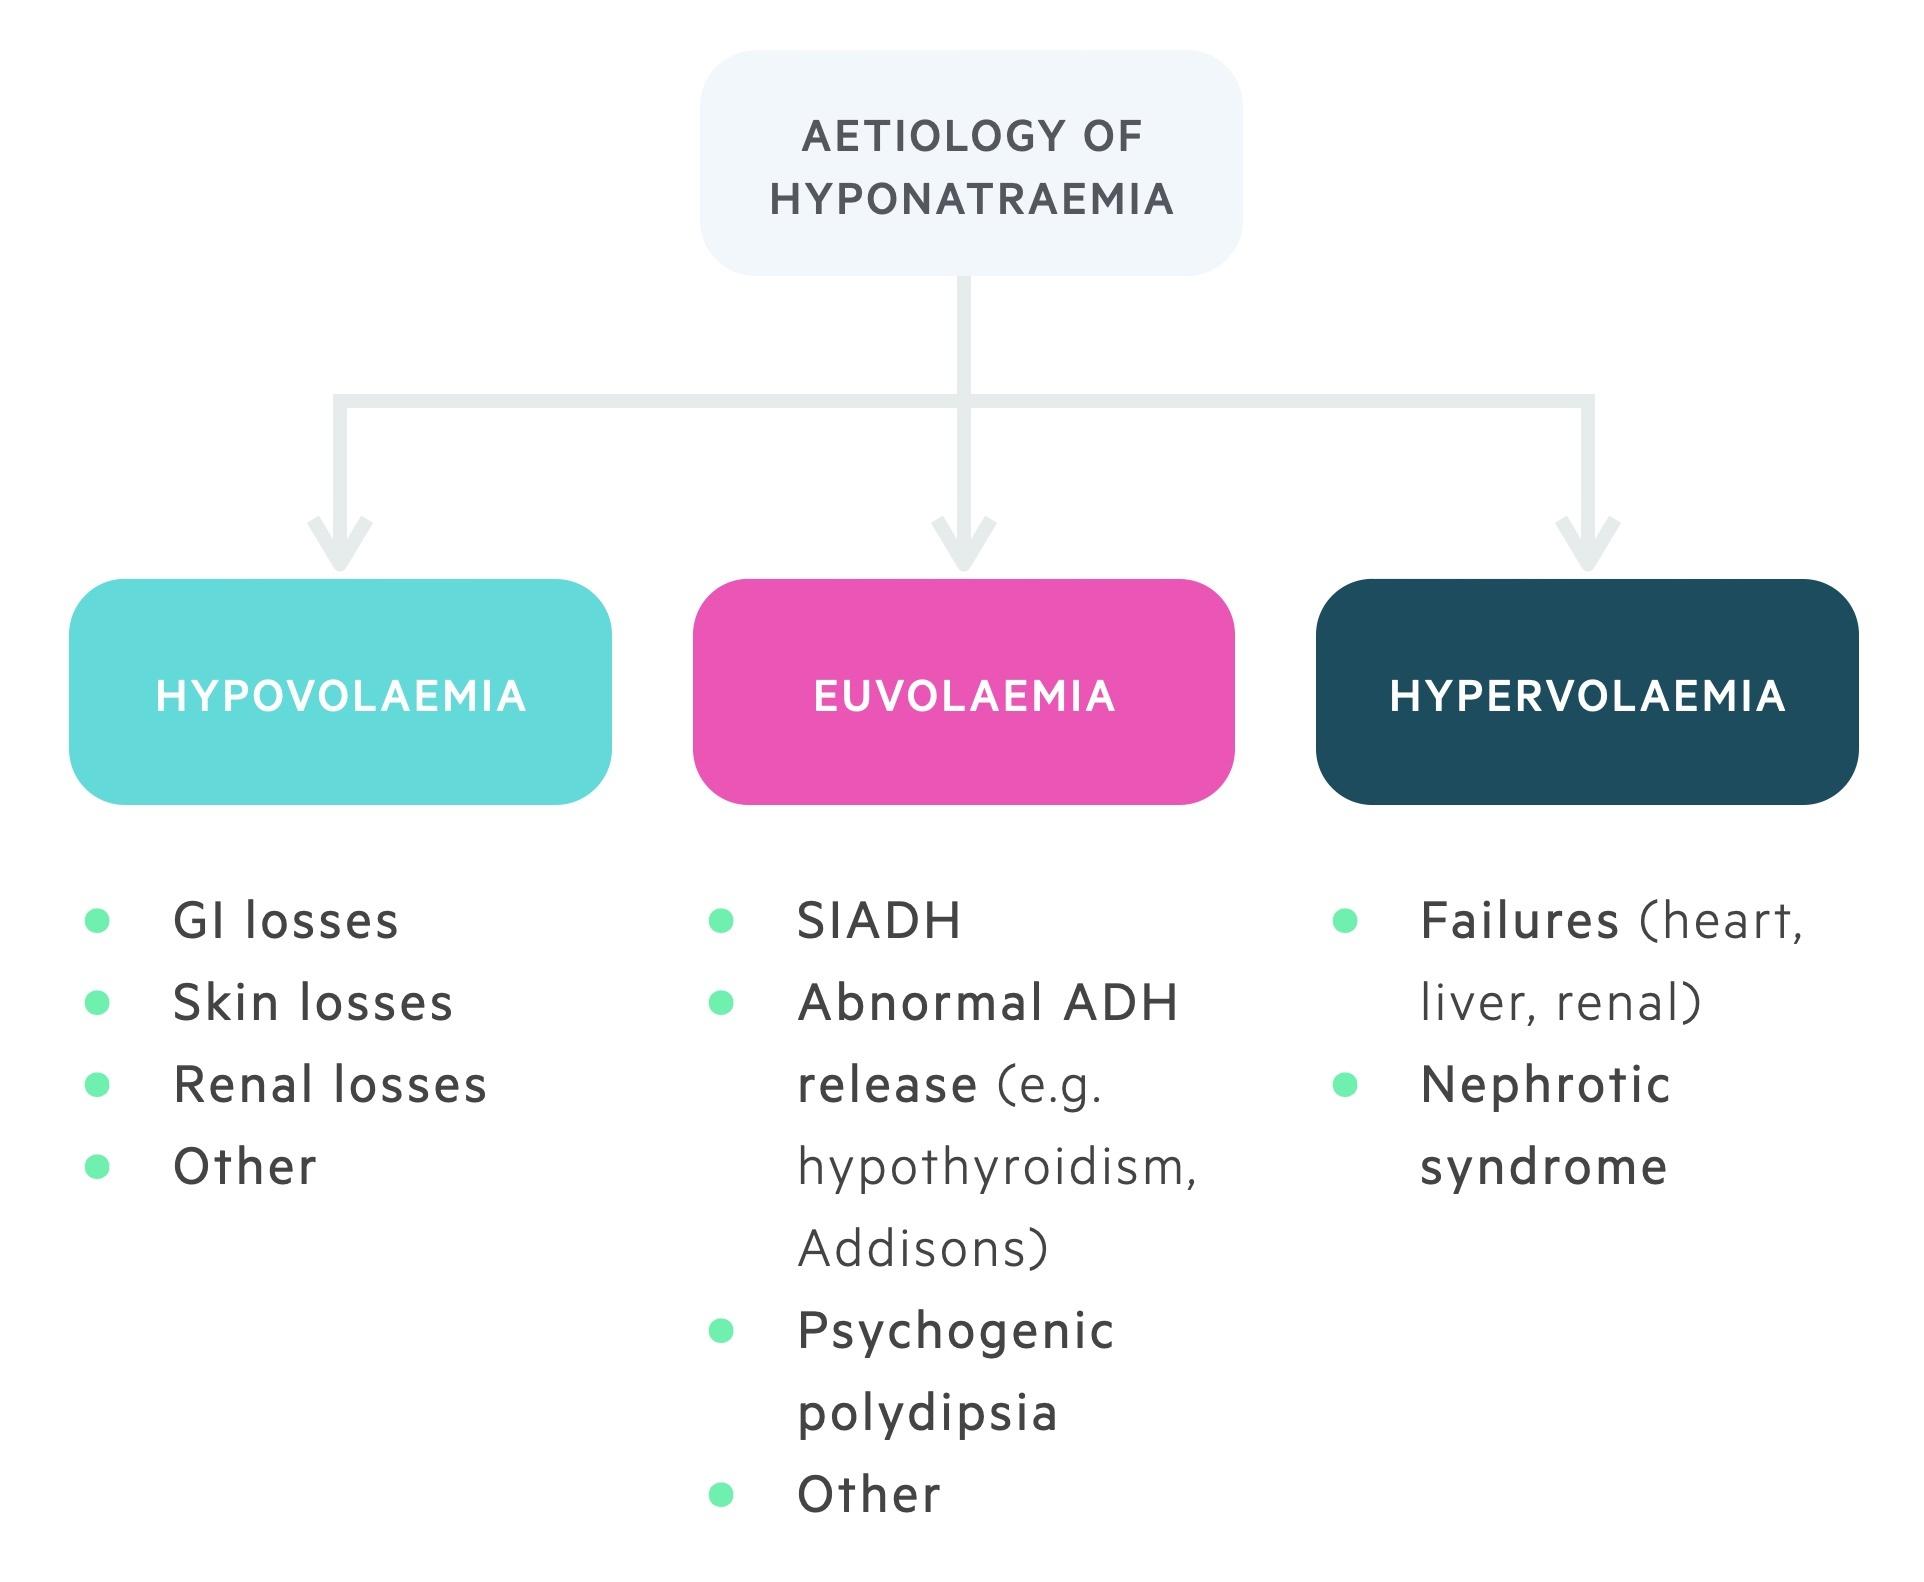 Aetiology of hyponatraemia